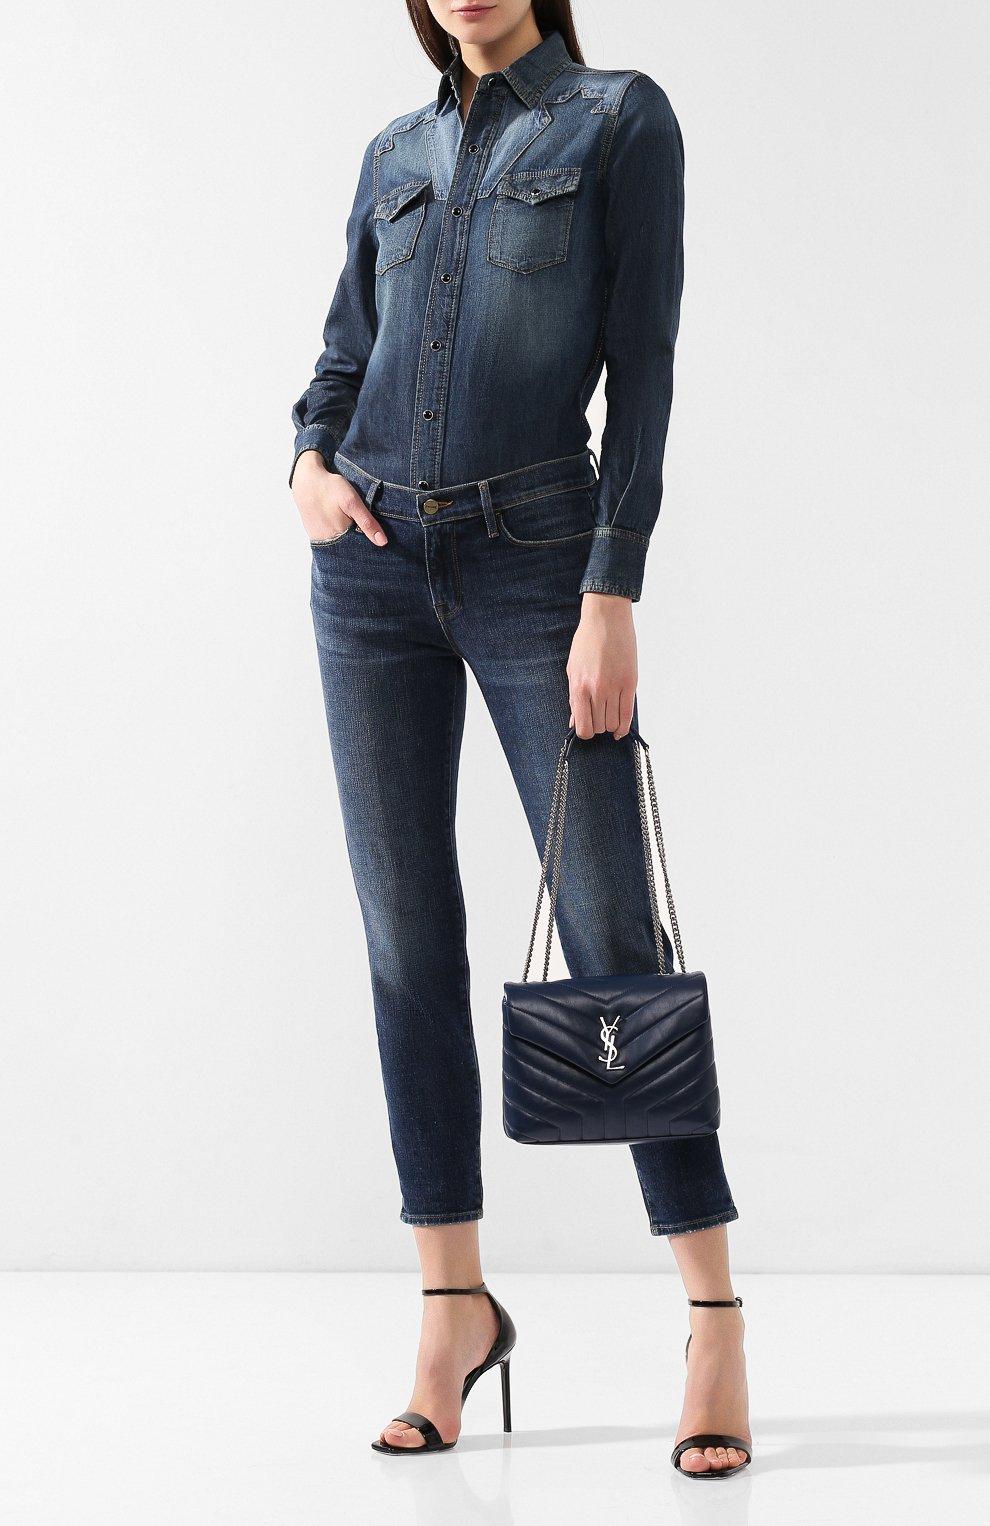 Женская сумка monogram loulou small SAINT LAURENT синего цвета, арт. 494699/DV726 | Фото 2